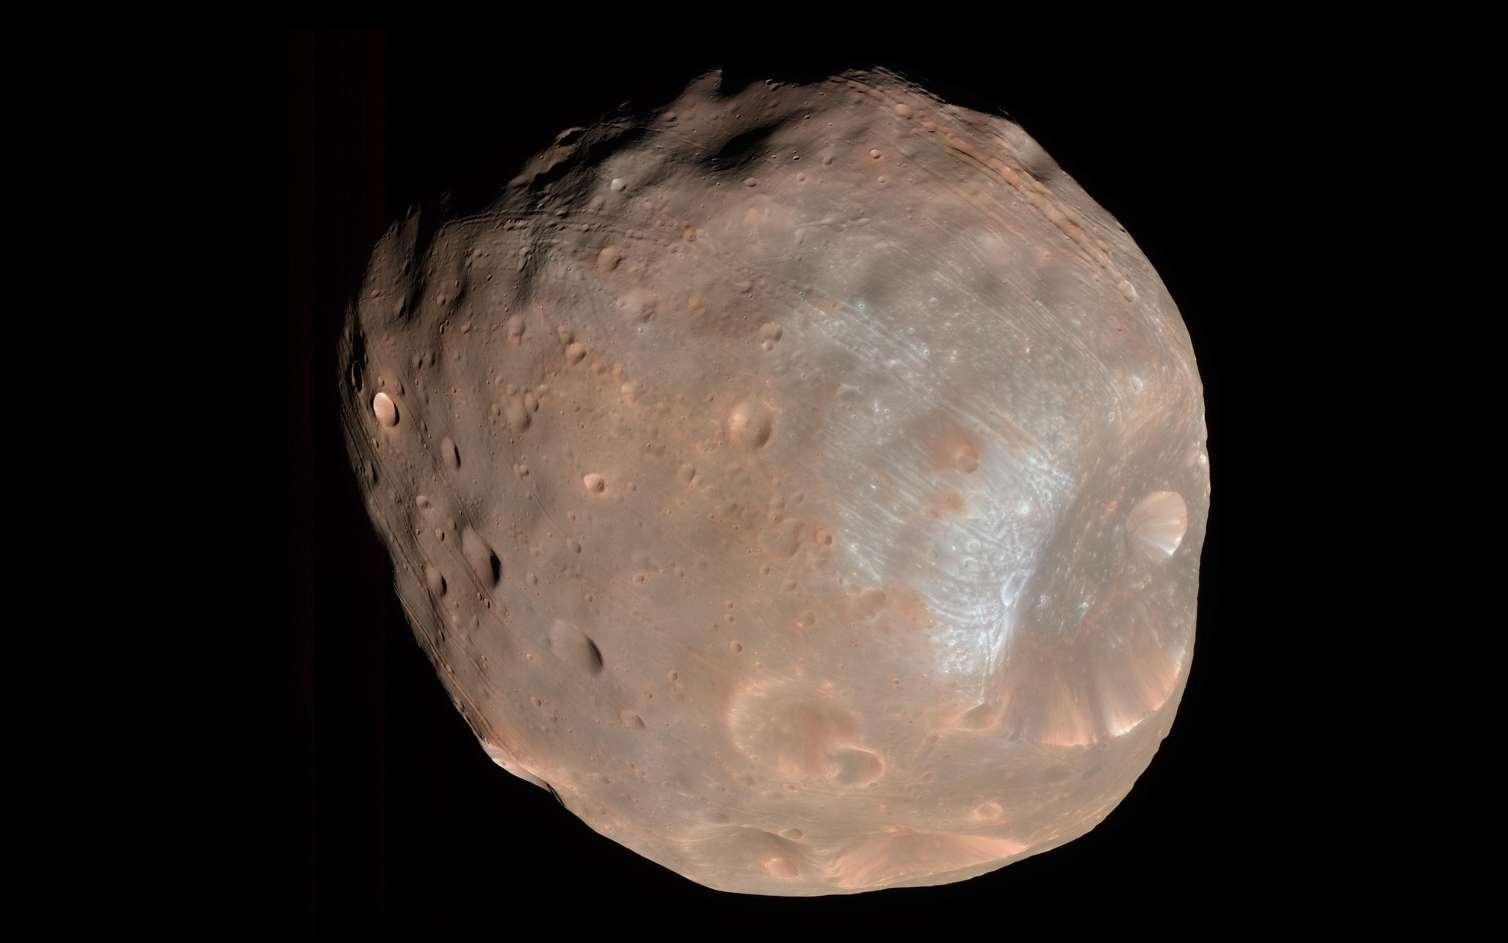 Phobos, petite lune de Mars, ici, photographiée par la sonde MRO. © Nasa/JPL-Caltech/University of Arizona